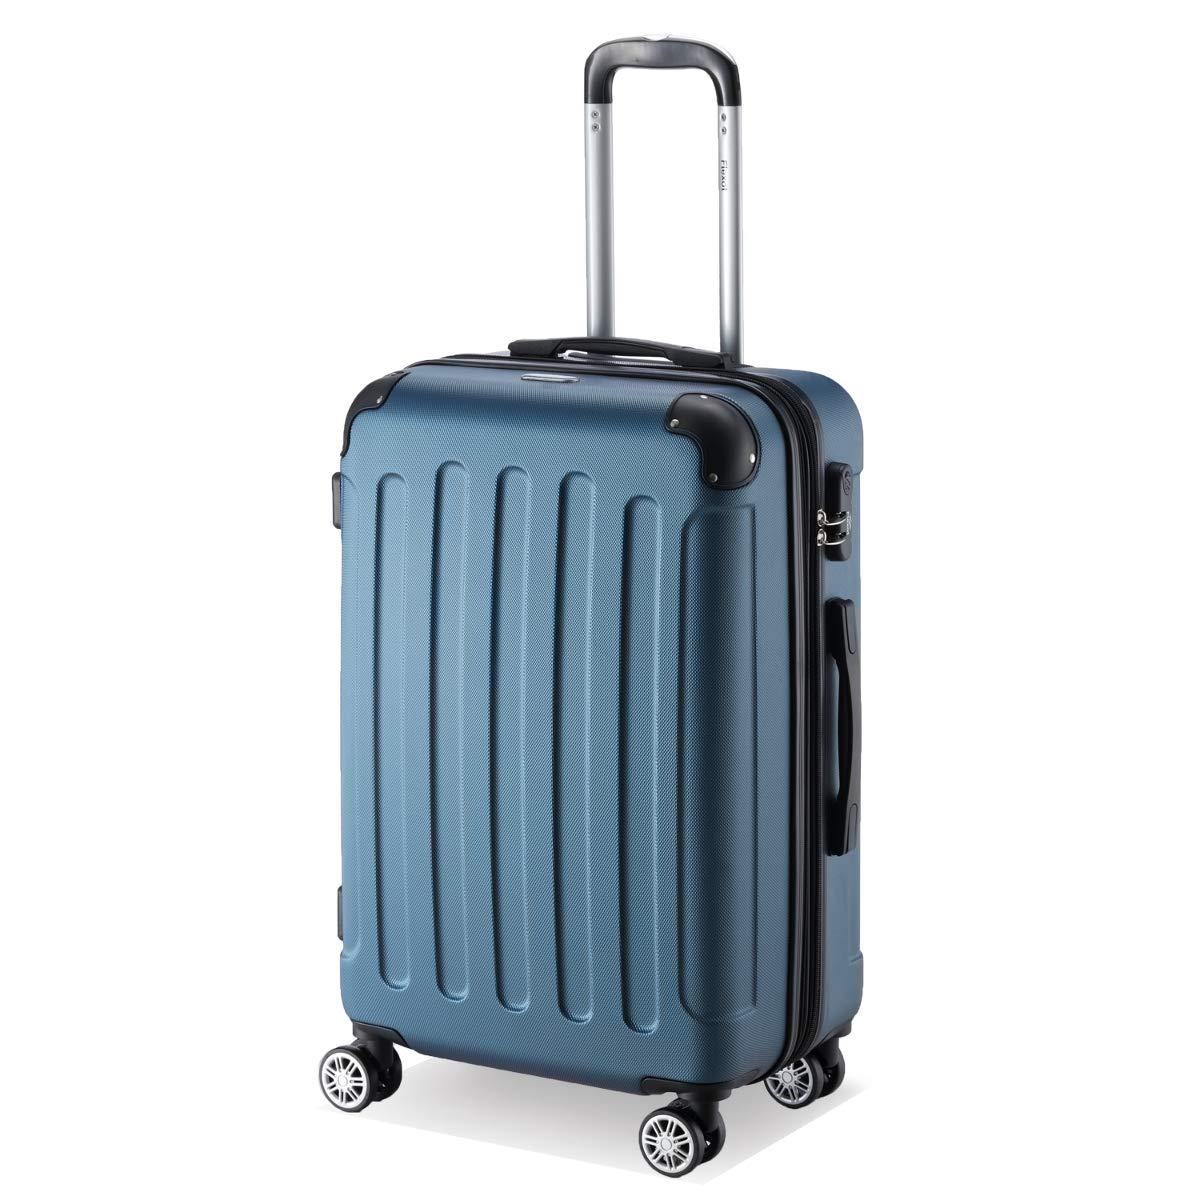 Flexot 2045 3er Reisekoffer Set Farbe Blau Gr/ö/ße M L XL Hartschalen-Koffer Trolley Rollkoffer Reisekoffer 4 Rollen